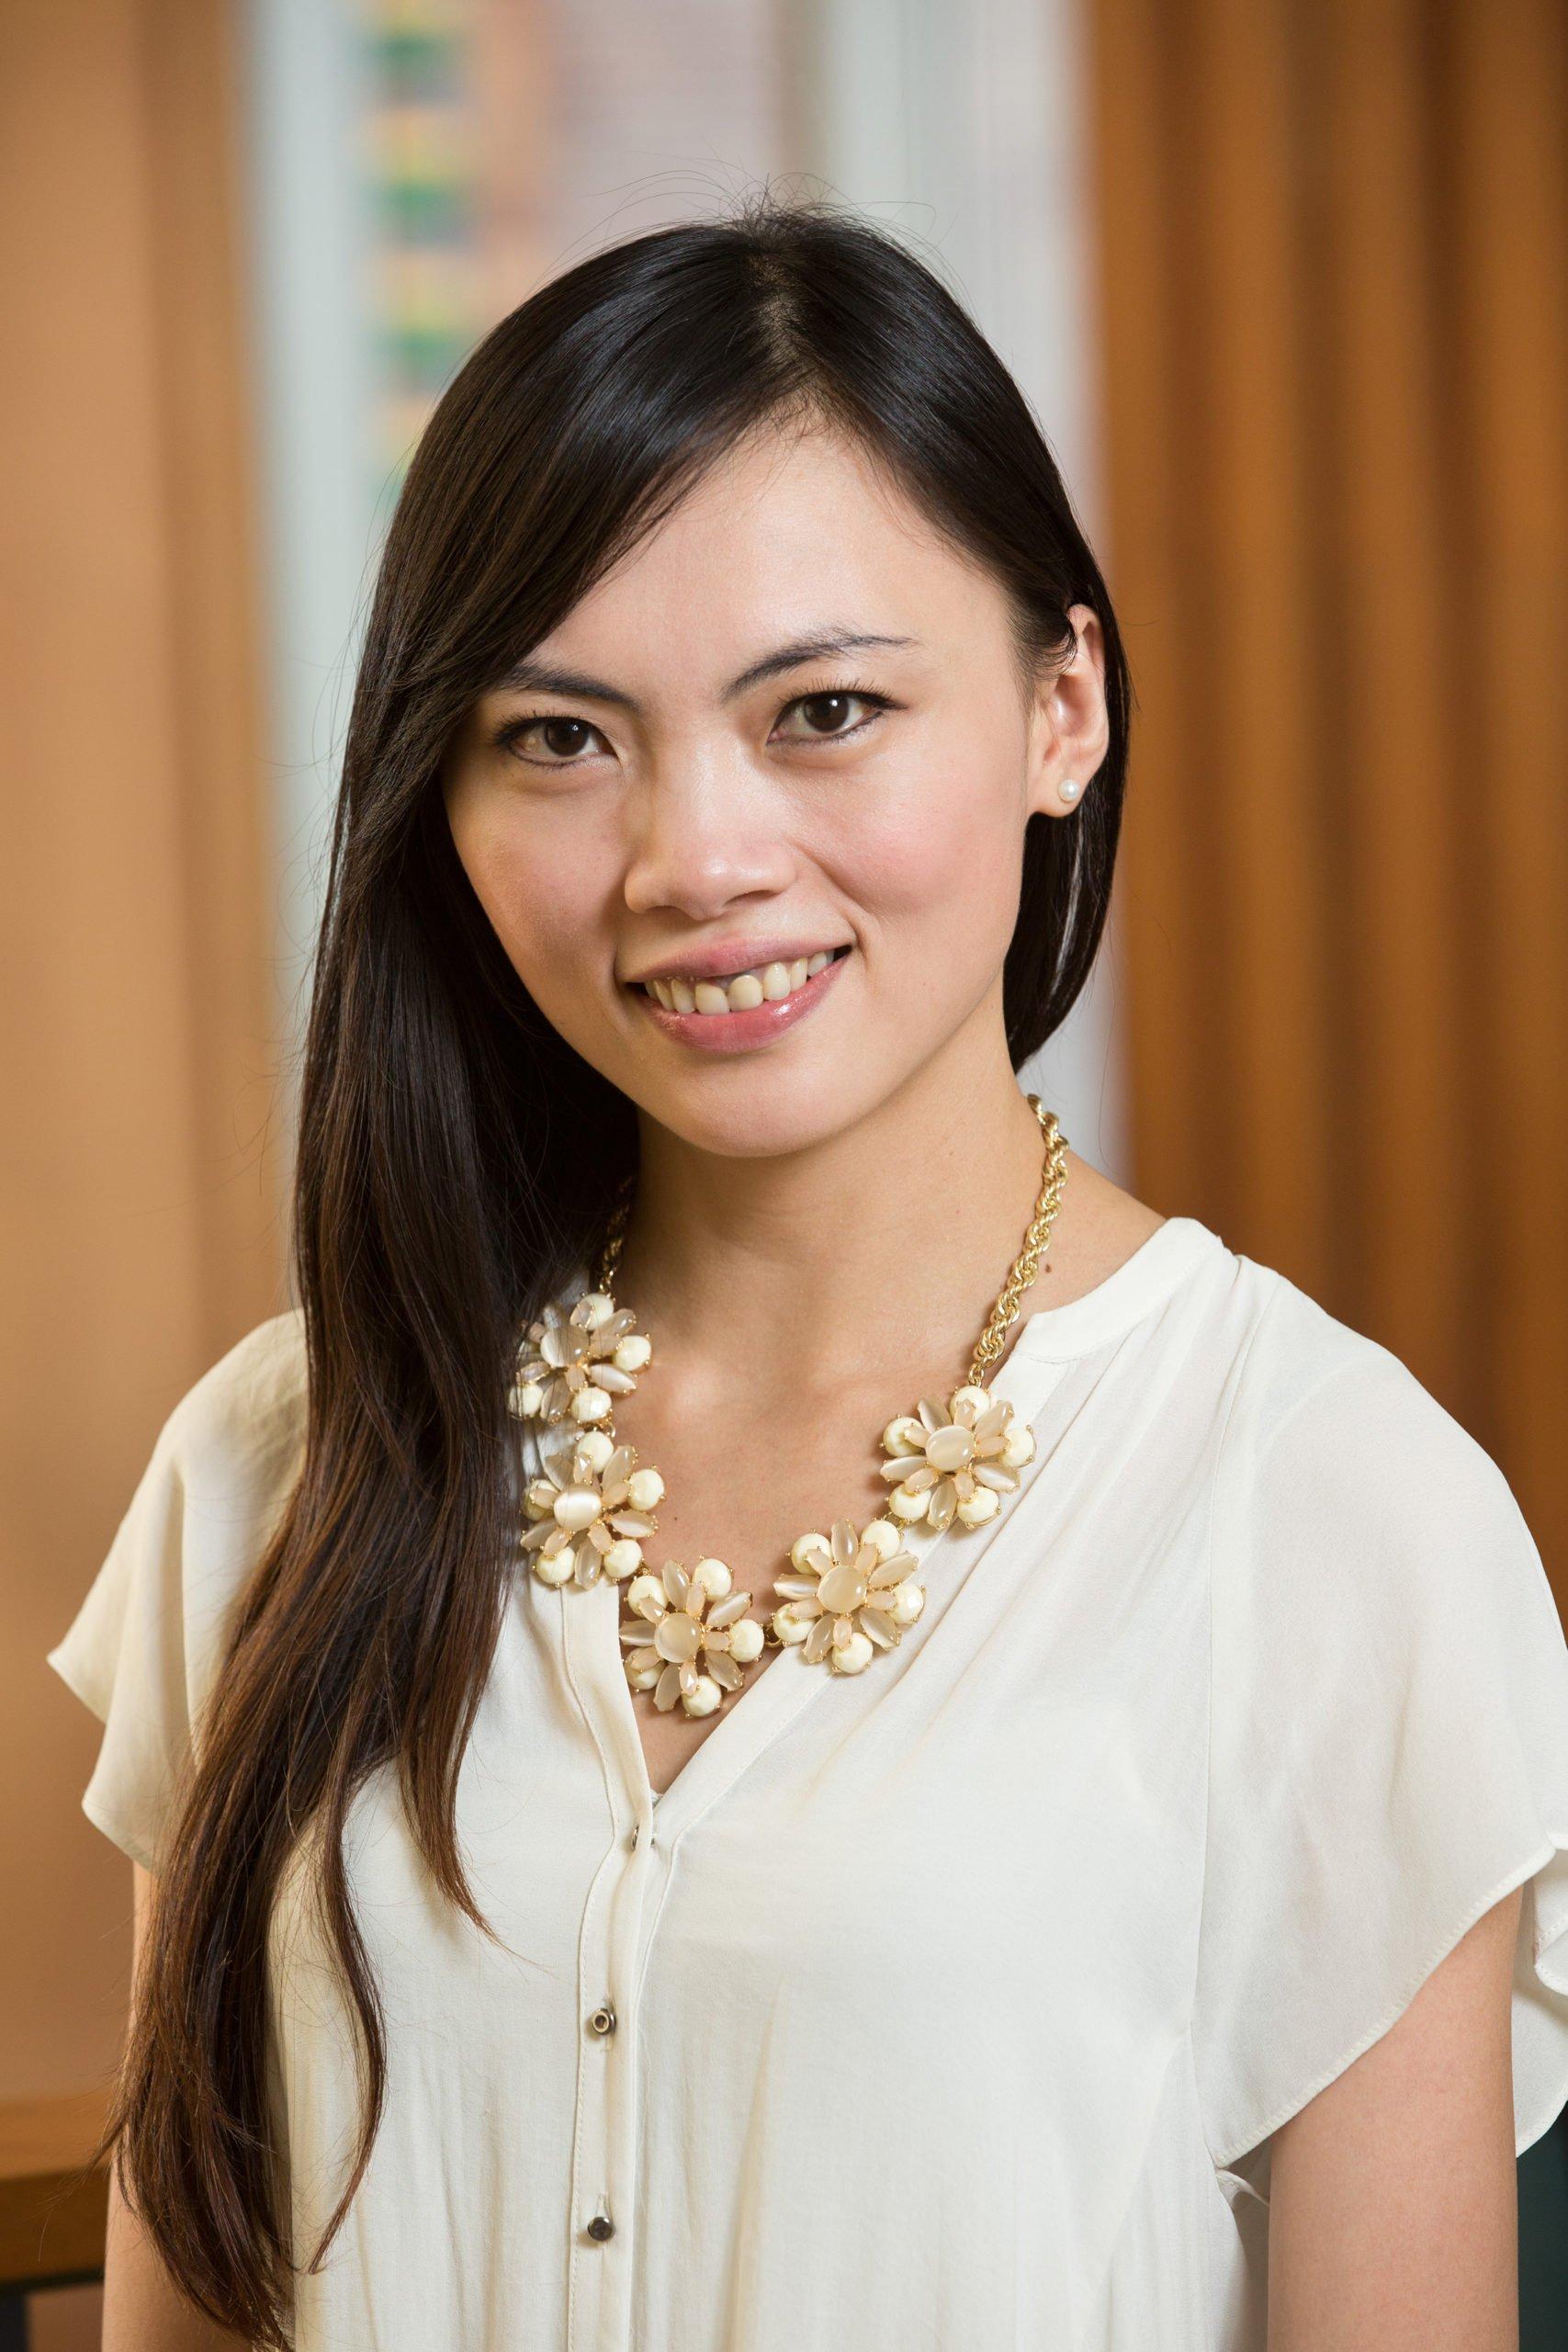 Hsing-Fang Hsieh, PhD